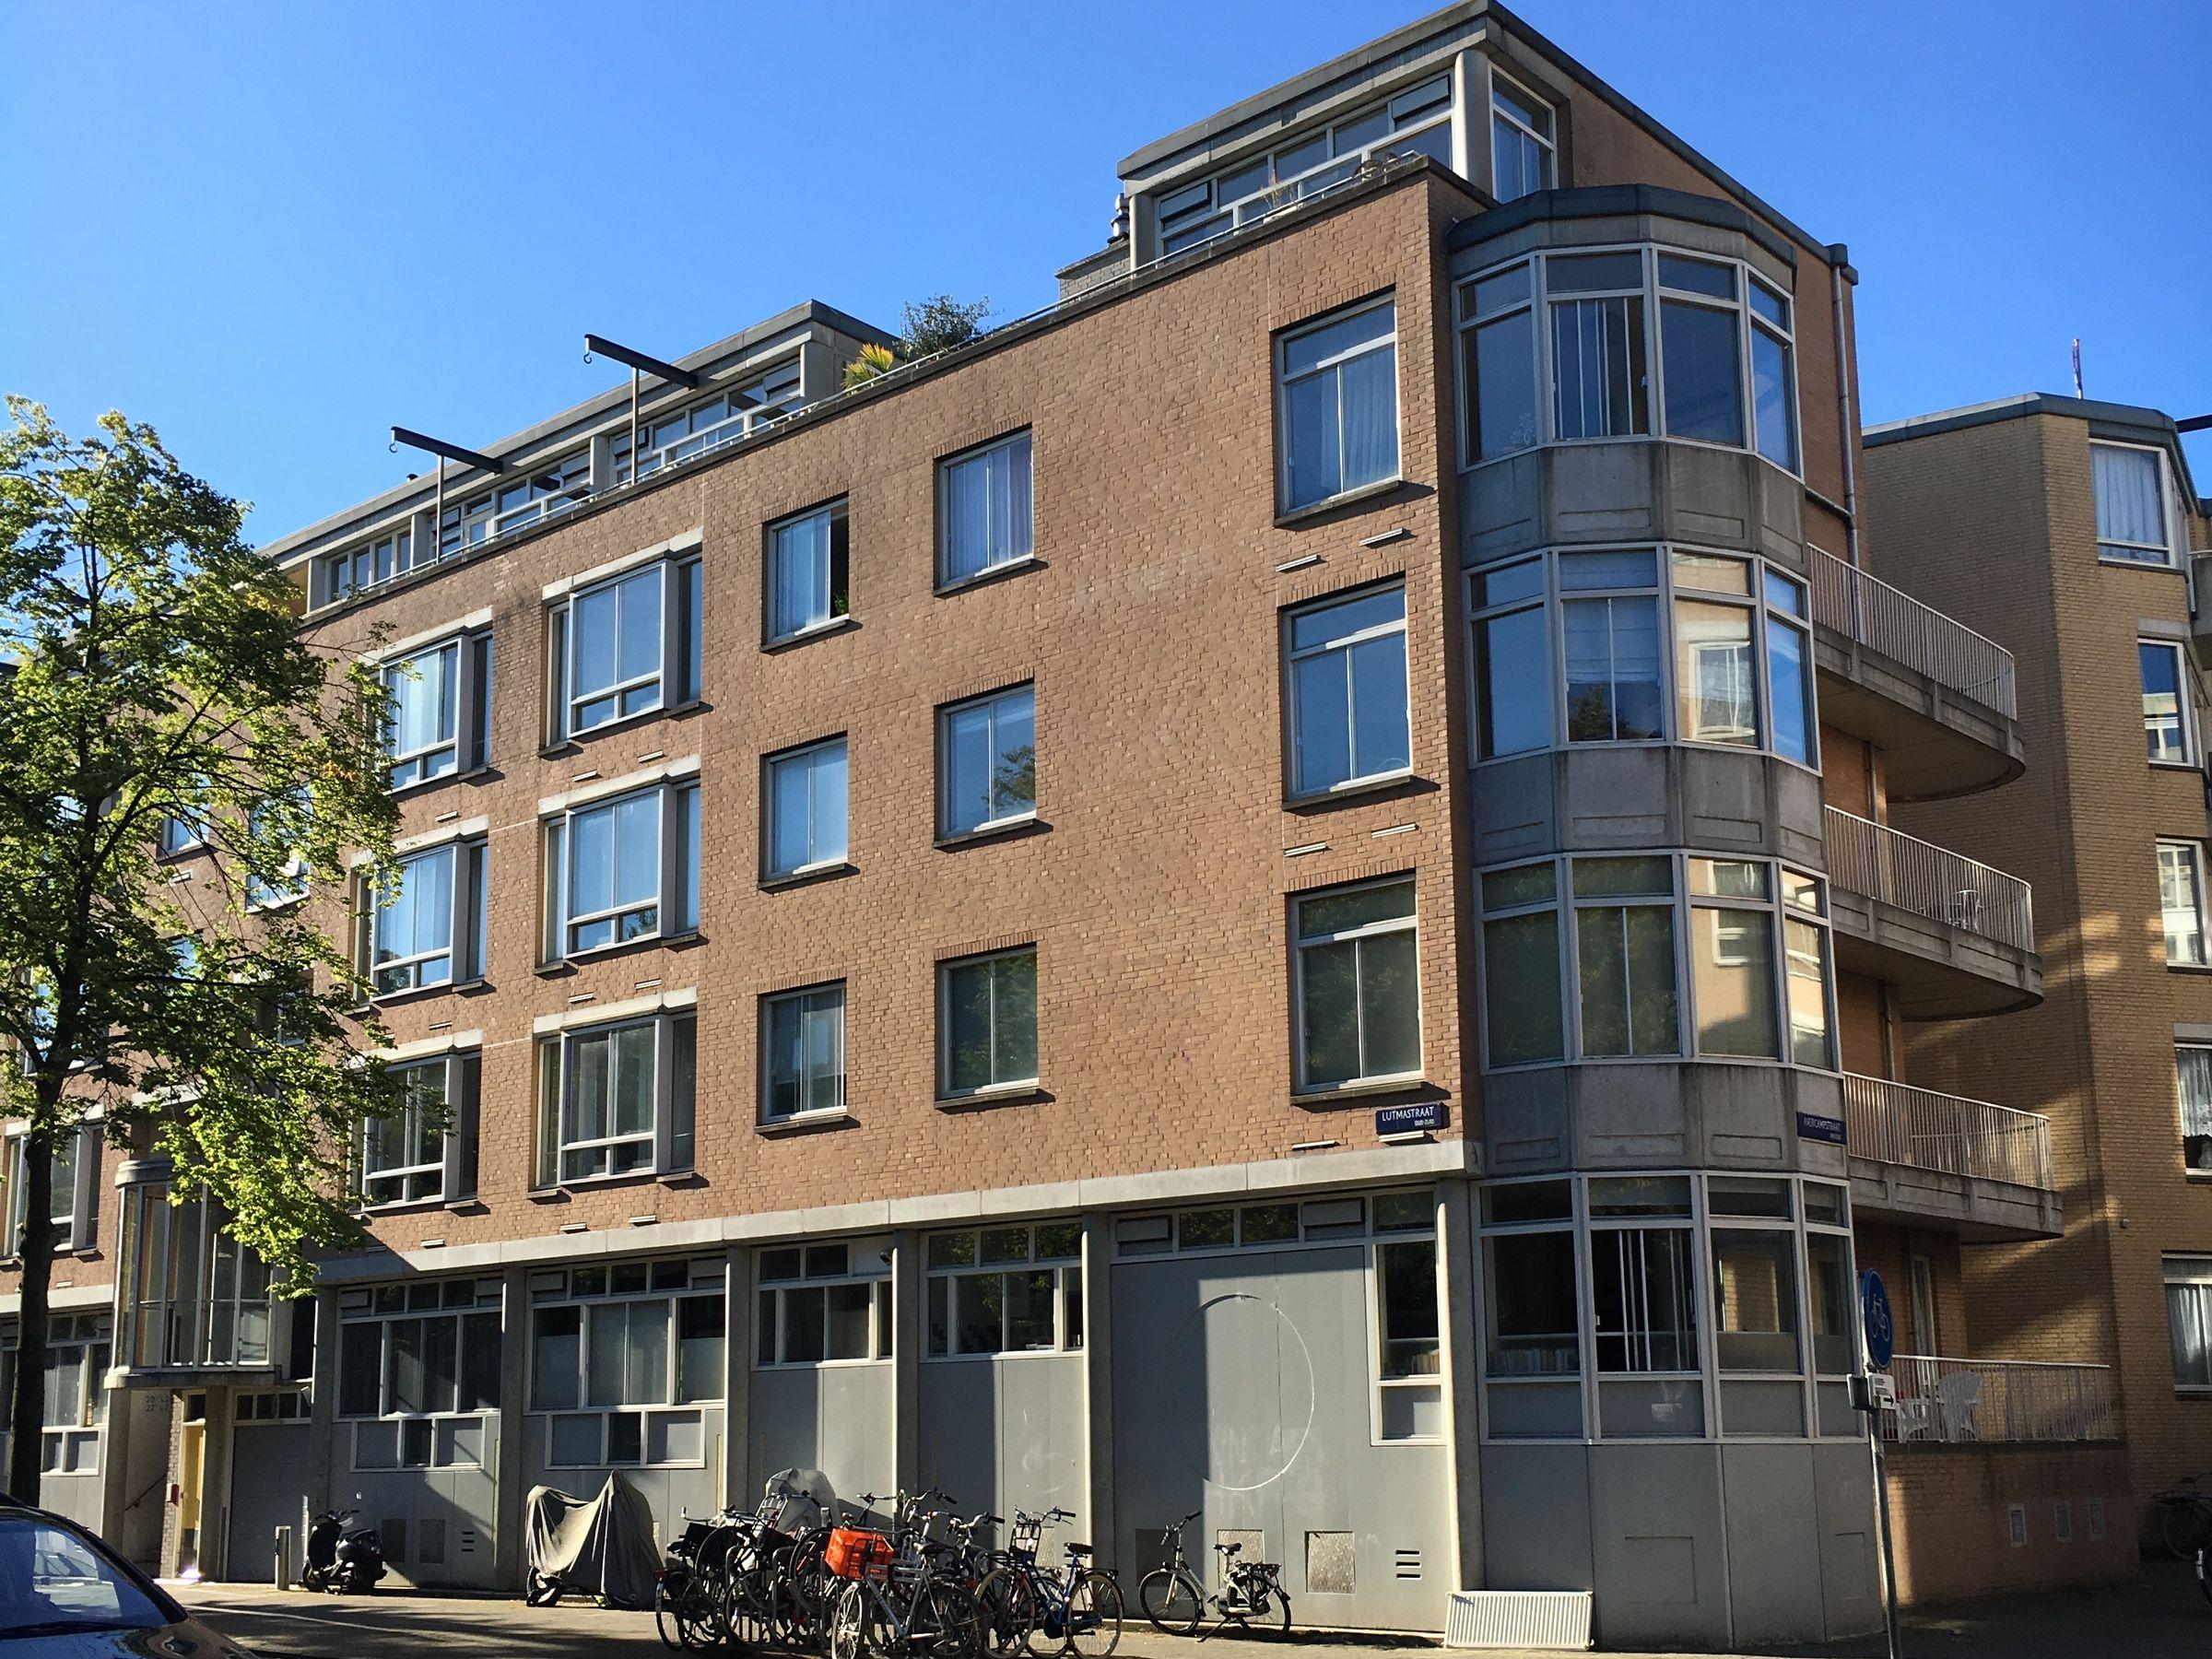 Avercampstraat, Amsterdam